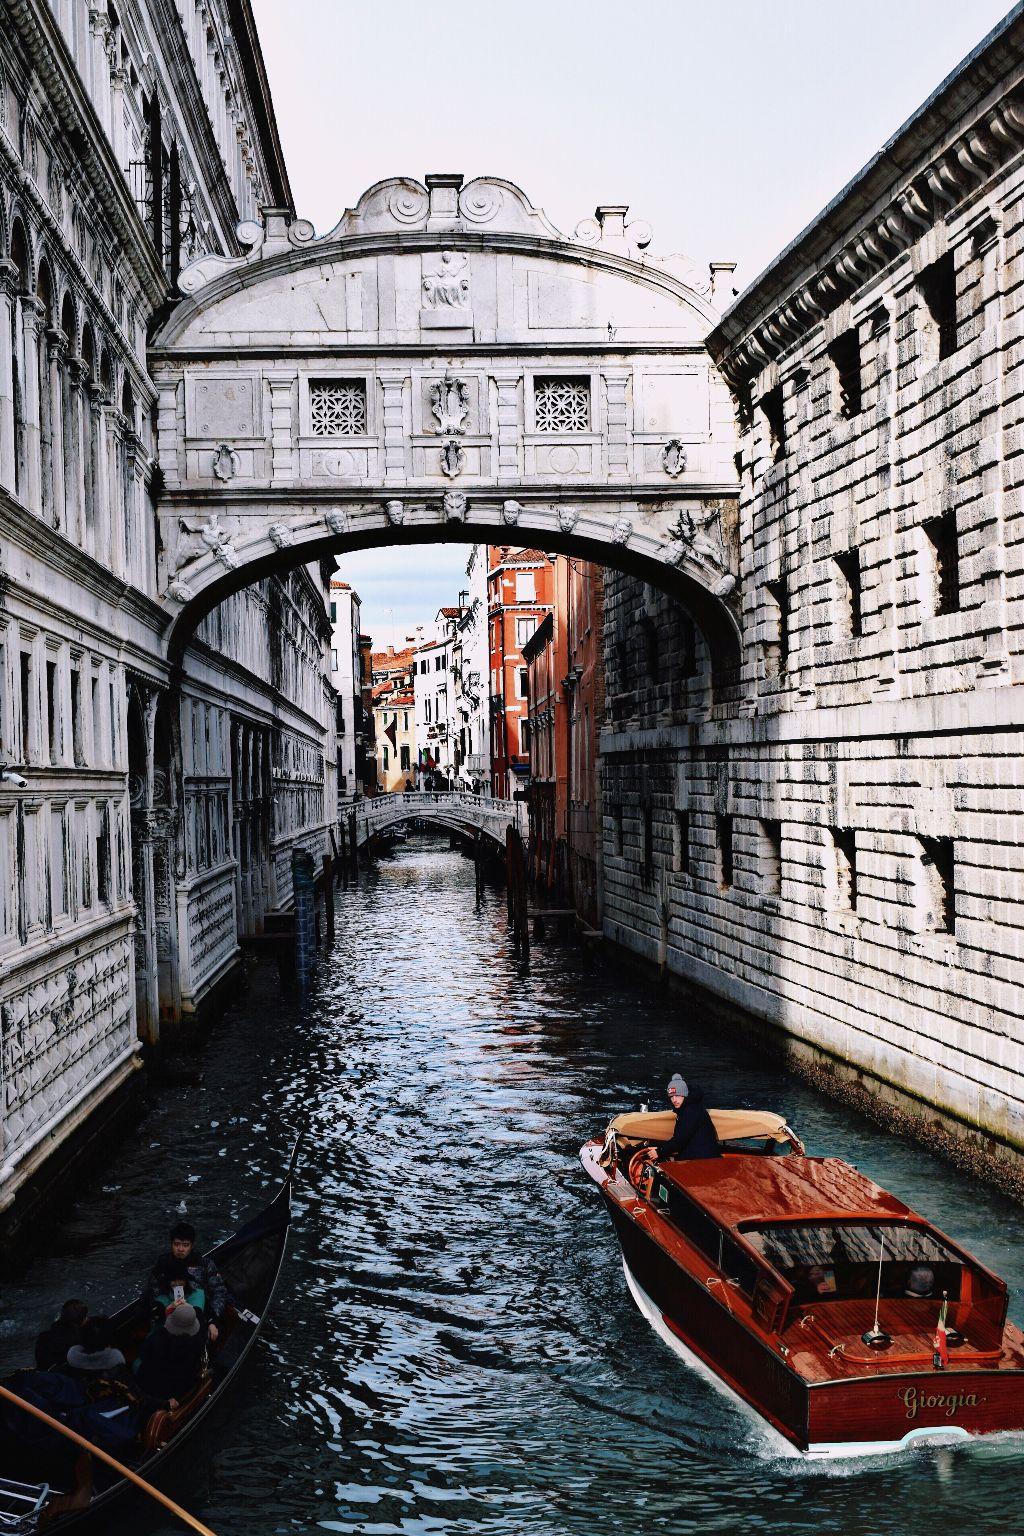 Ponte dei sospiri #freetoedit #interesting #italy #travel #photography #sea #architecture #pccitywalk #pcamazingarches